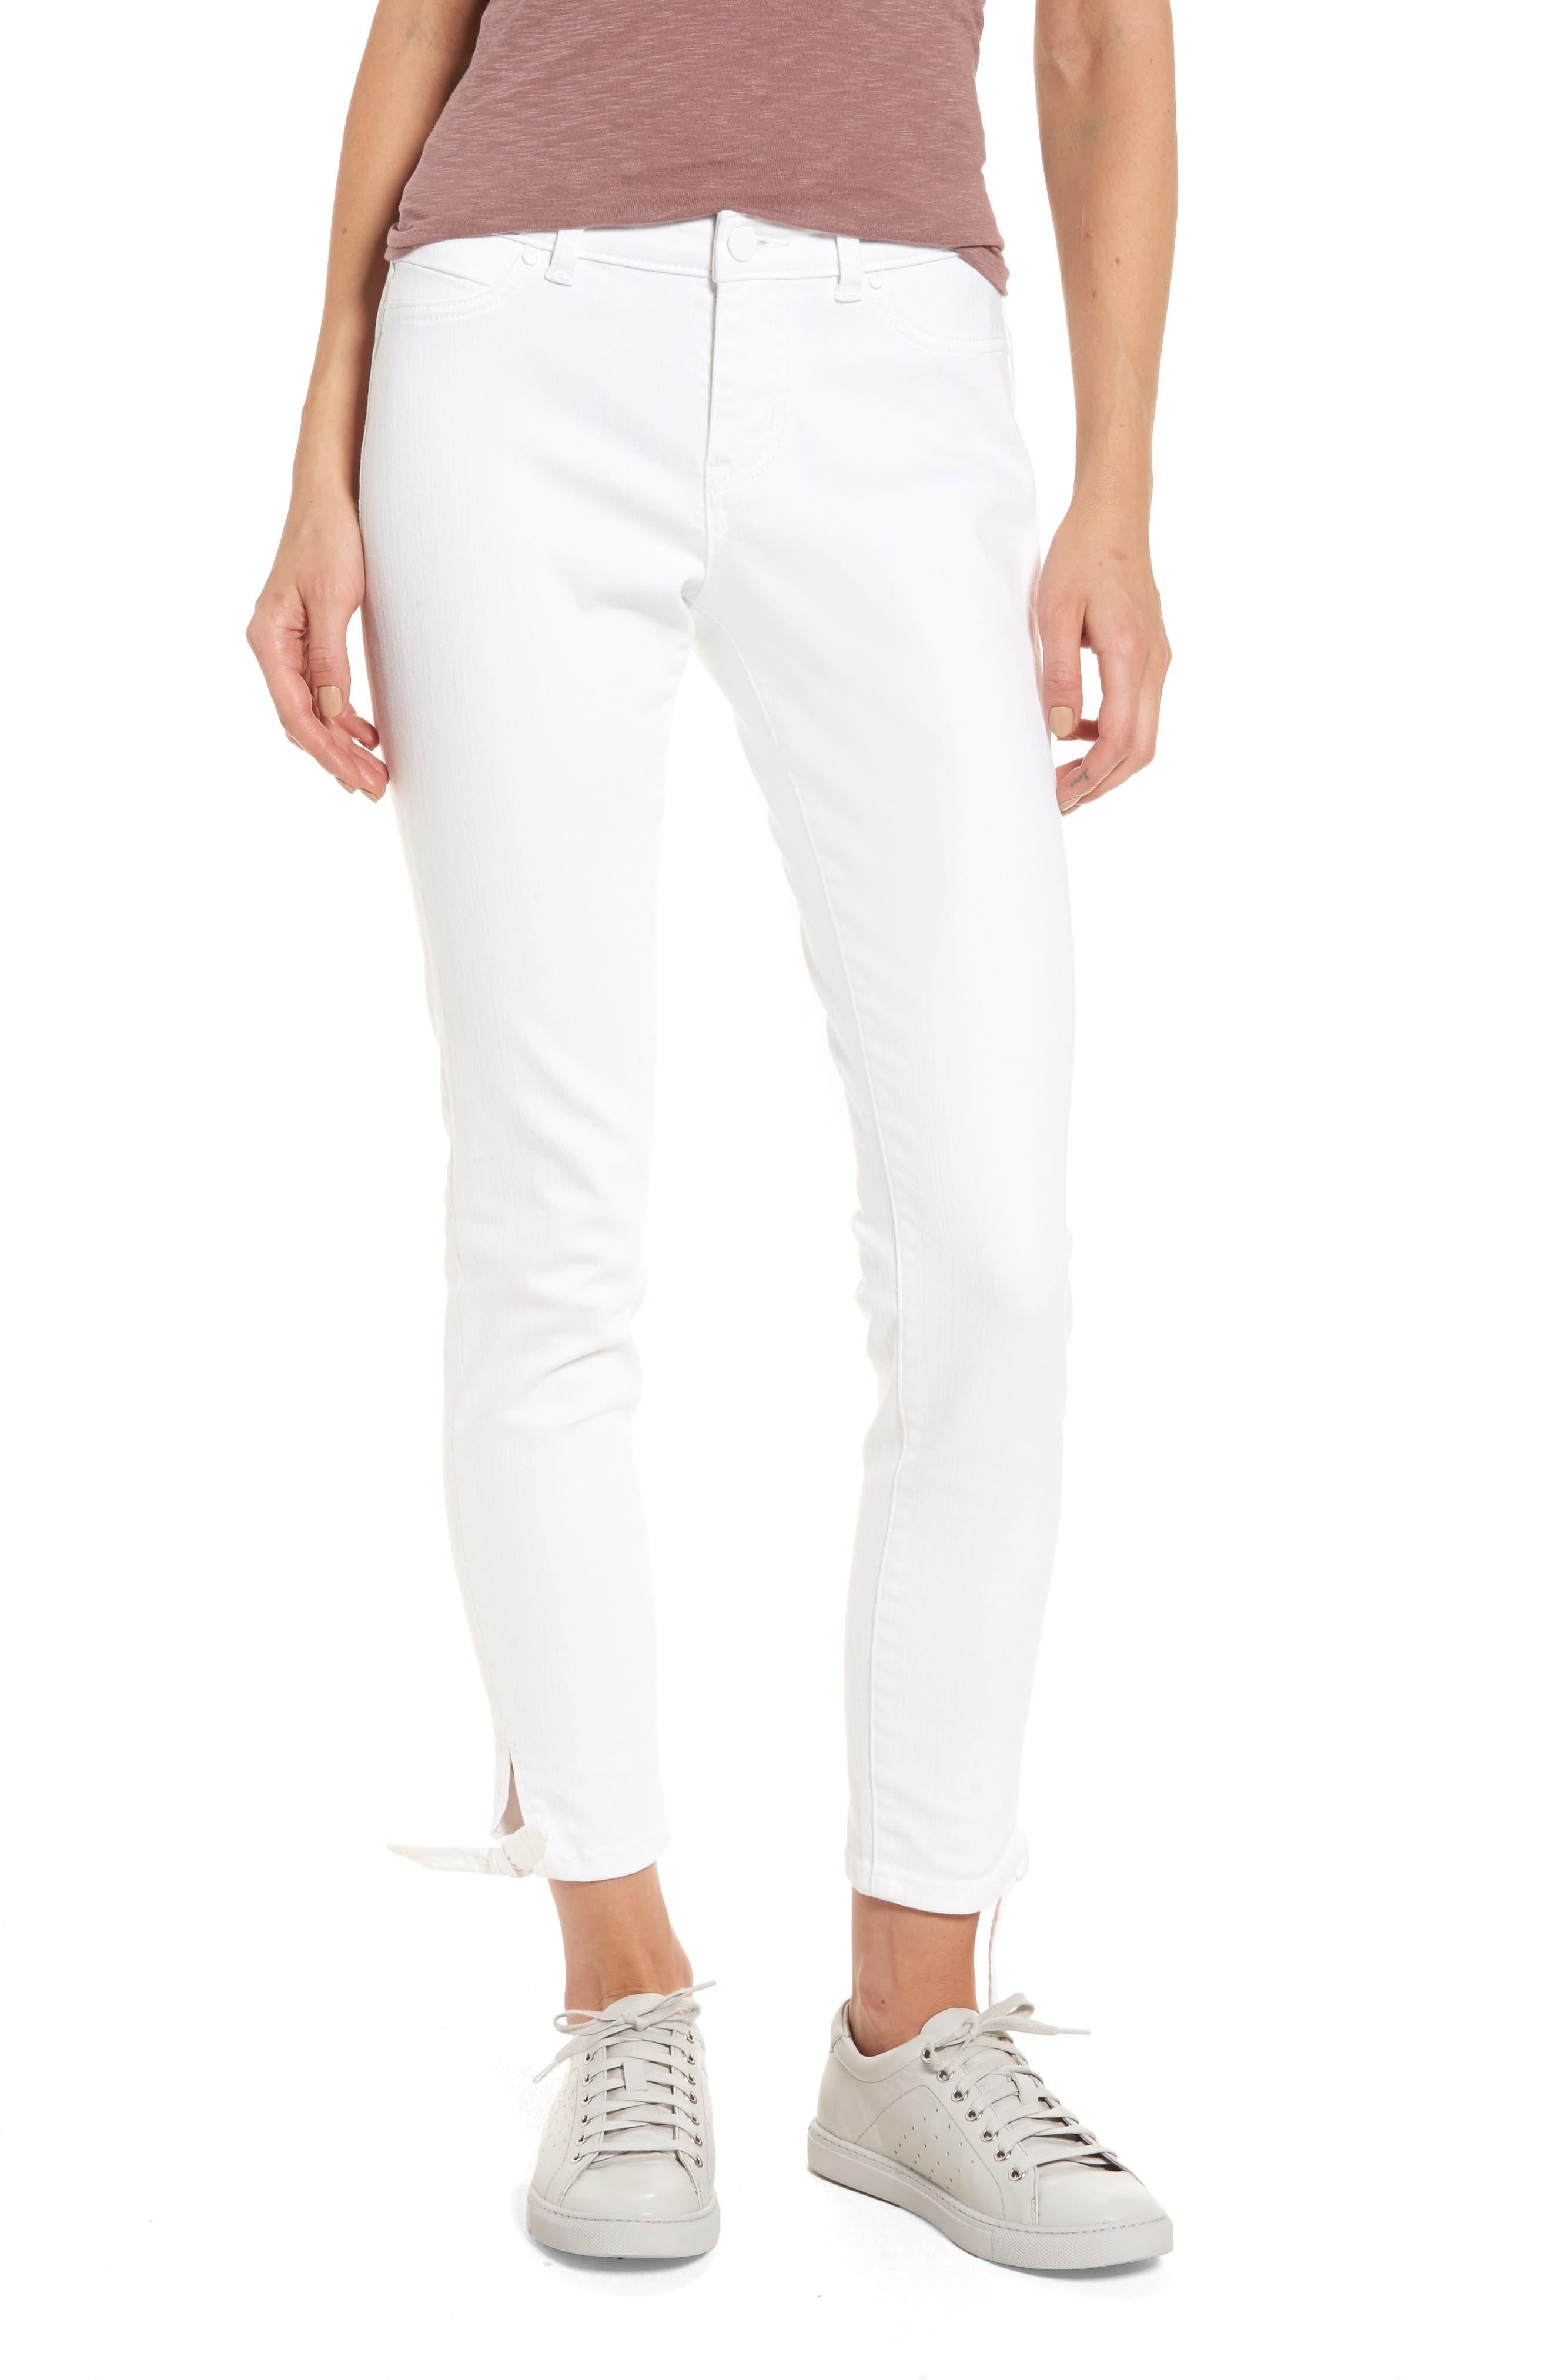 Main Image - Caslon® Tie Ankle Skinny Jeans (Regular & Petite)